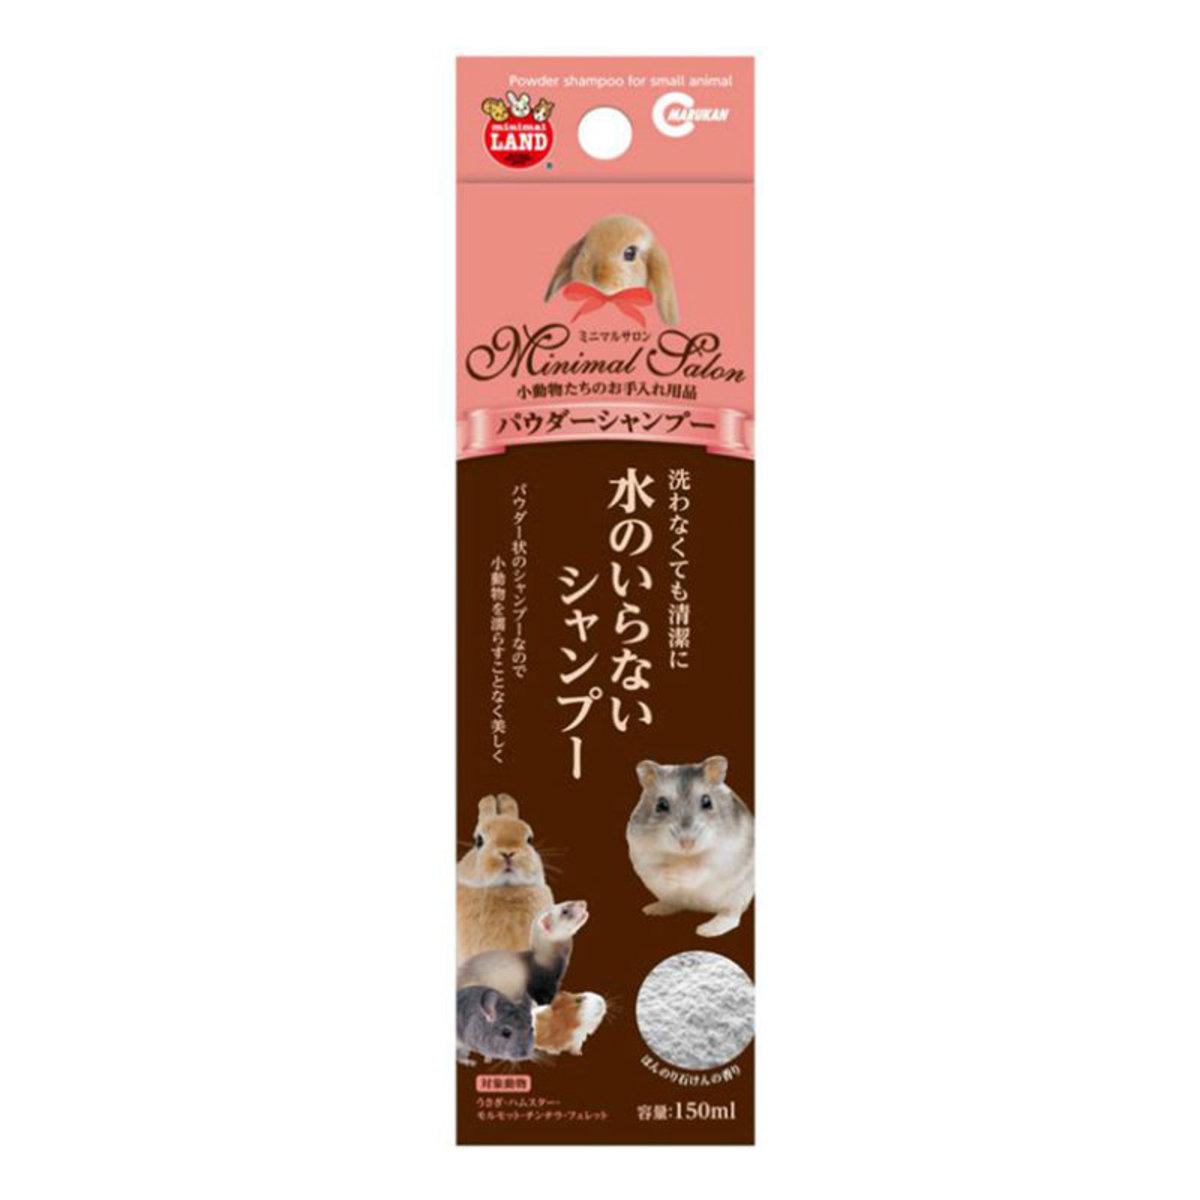 ML-365 Minimal Salon Power Shampoo 150ml